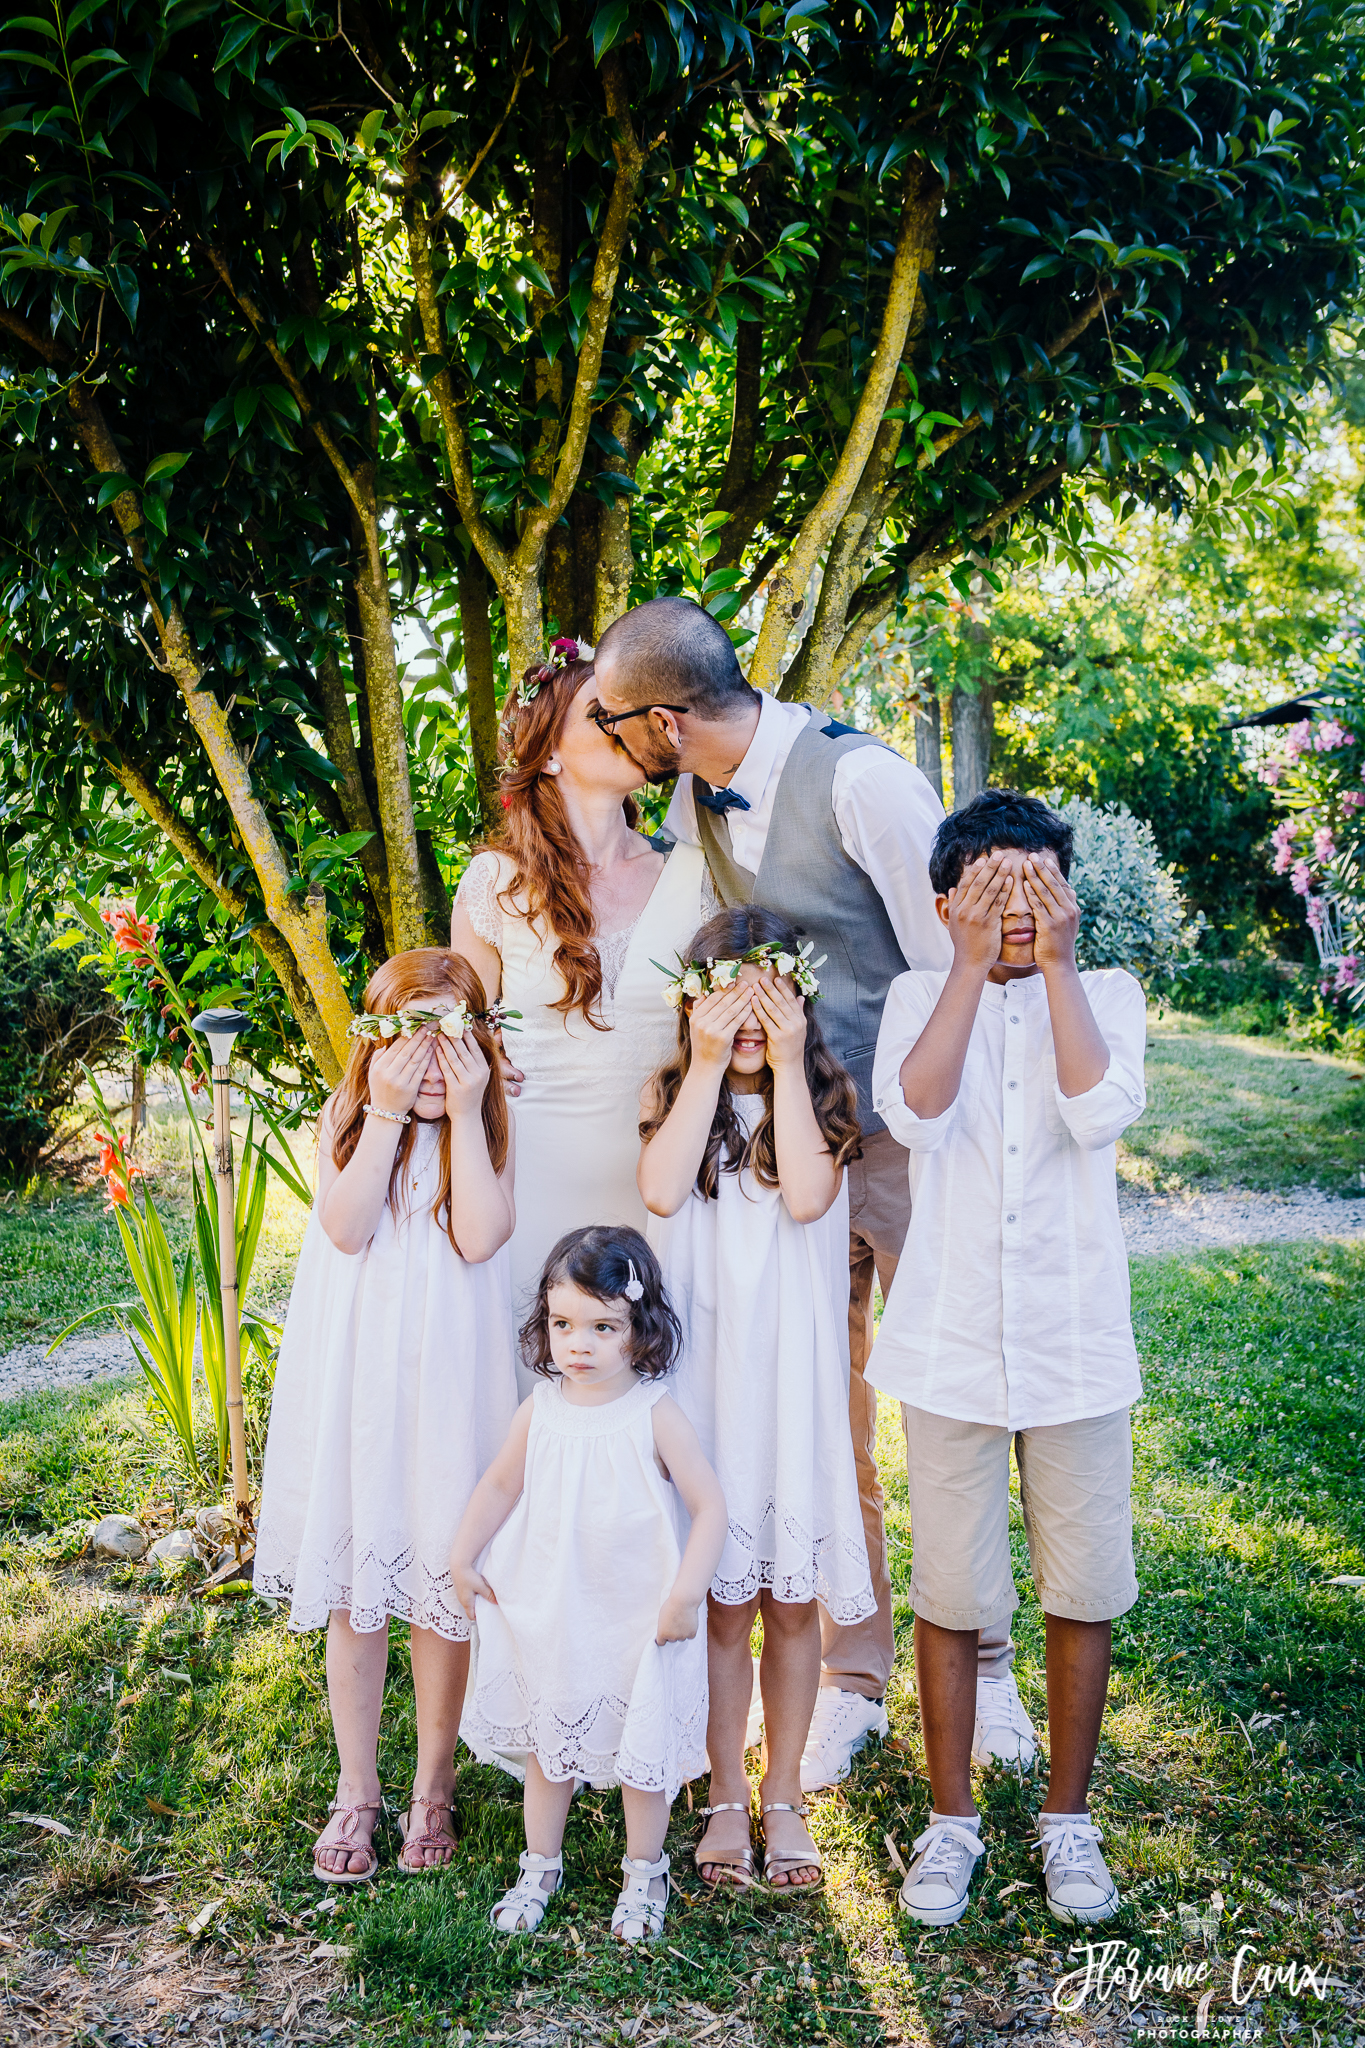 photographe-mariage-toulouse-rocknroll-maries-tatoues-floriane-caux-103